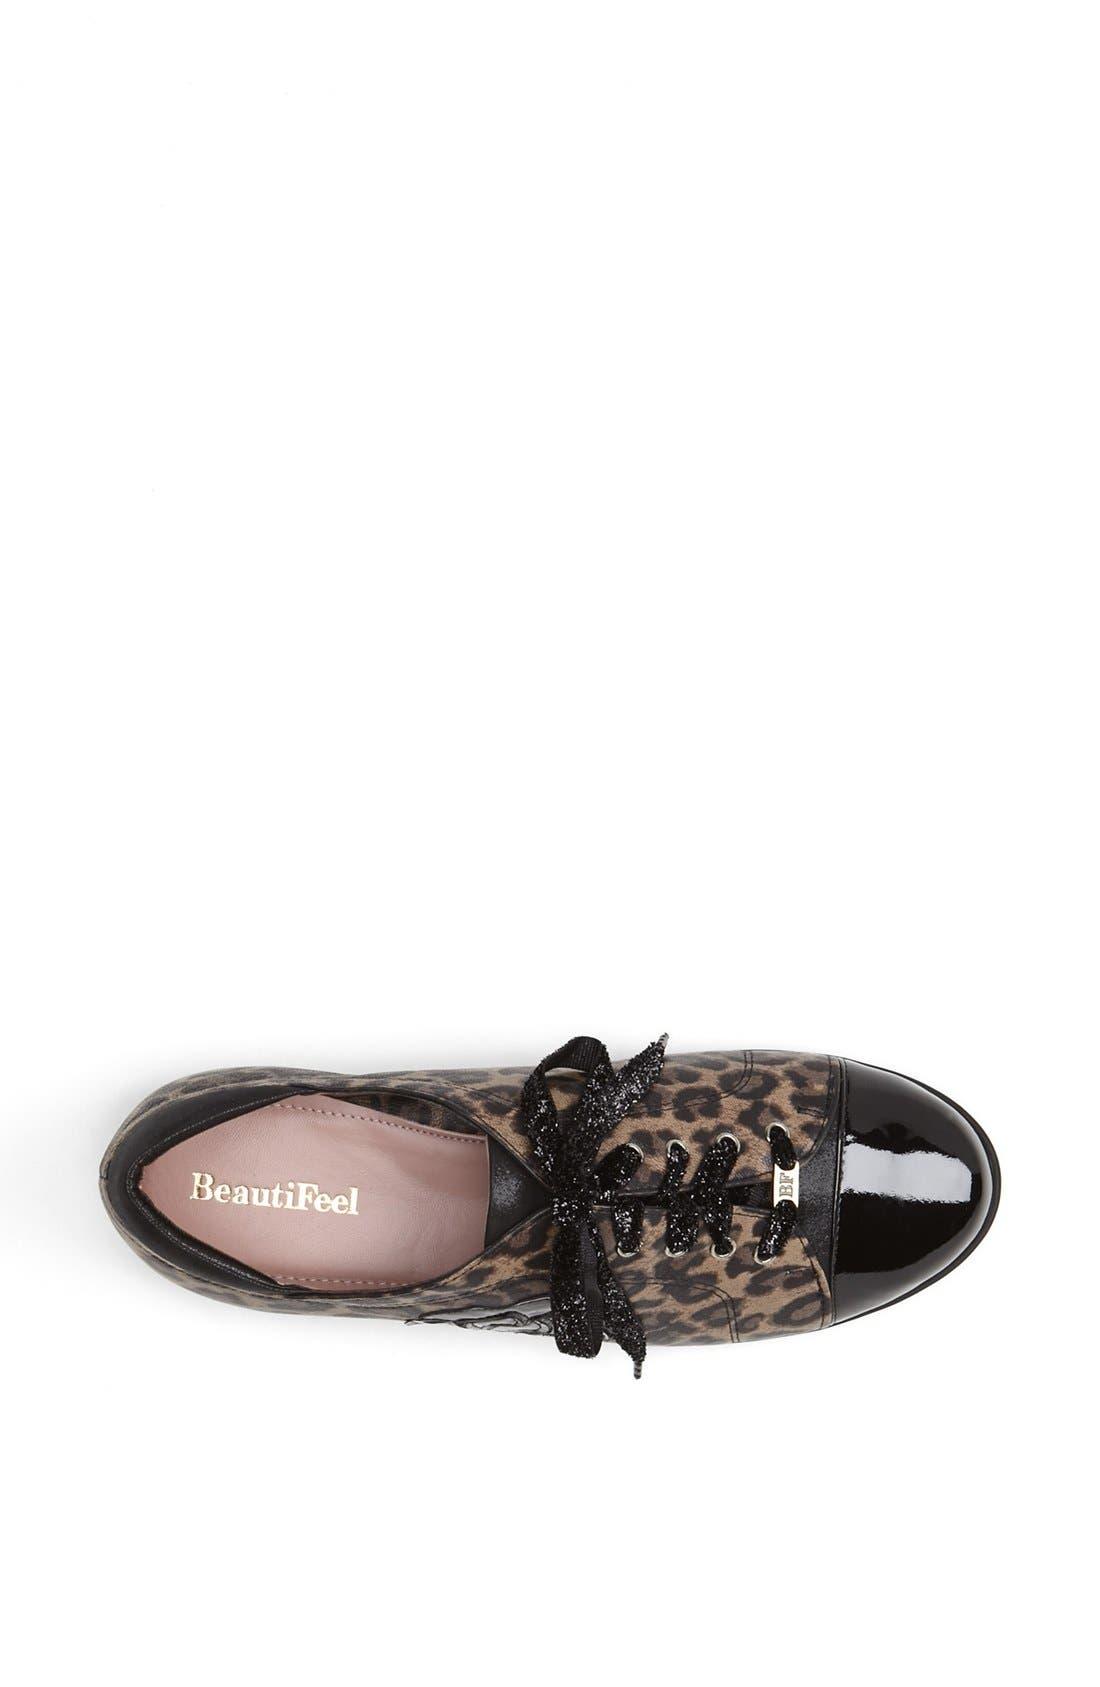 'Aria' Sneaker,                             Alternate thumbnail 3, color,                             Leopard Print Leather